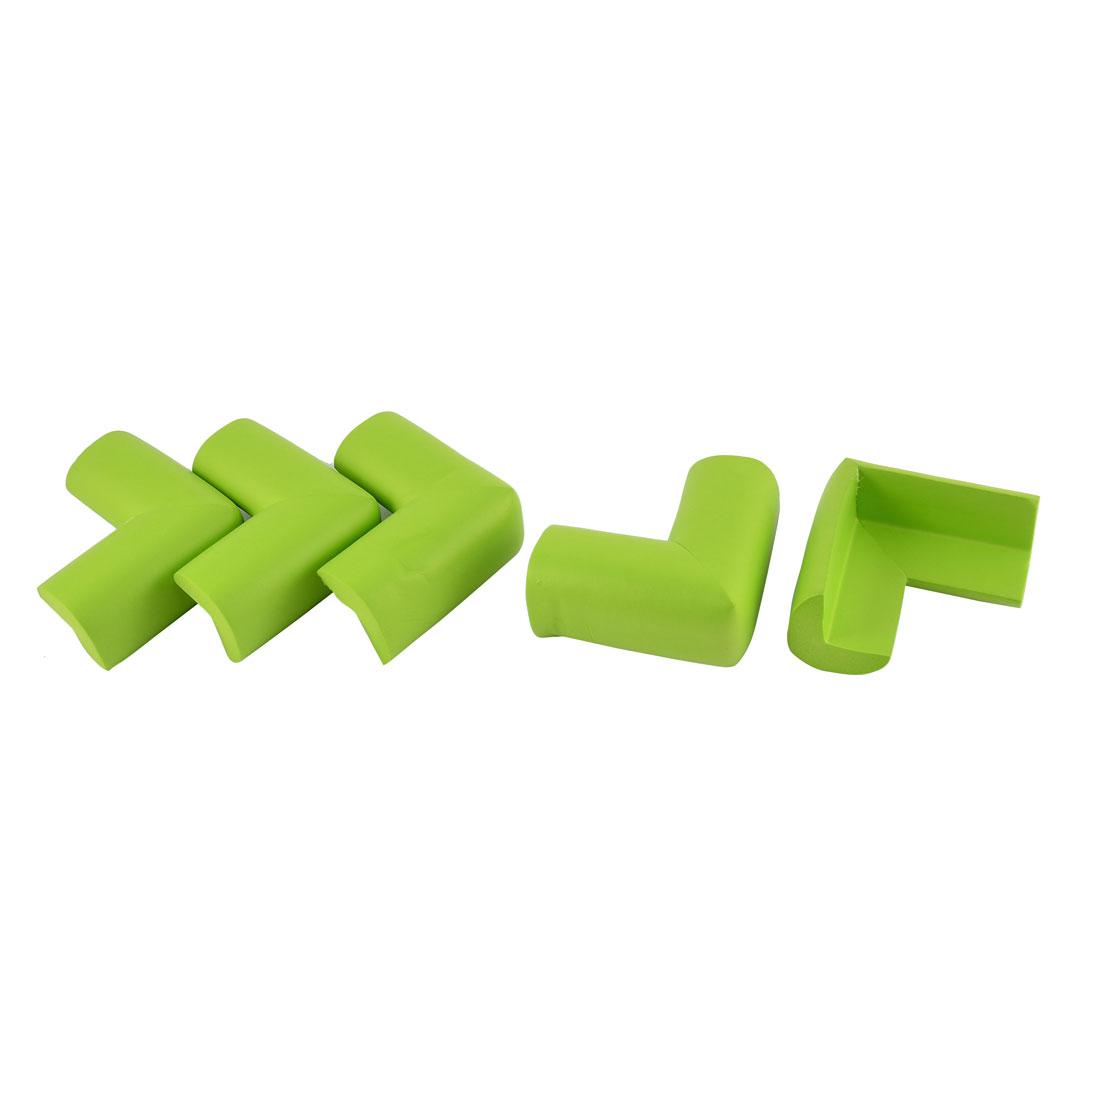 L Shape Cushion Table Corner Edge Guard Protector 70mm x 35mm x 12mm Green 5 Pcs